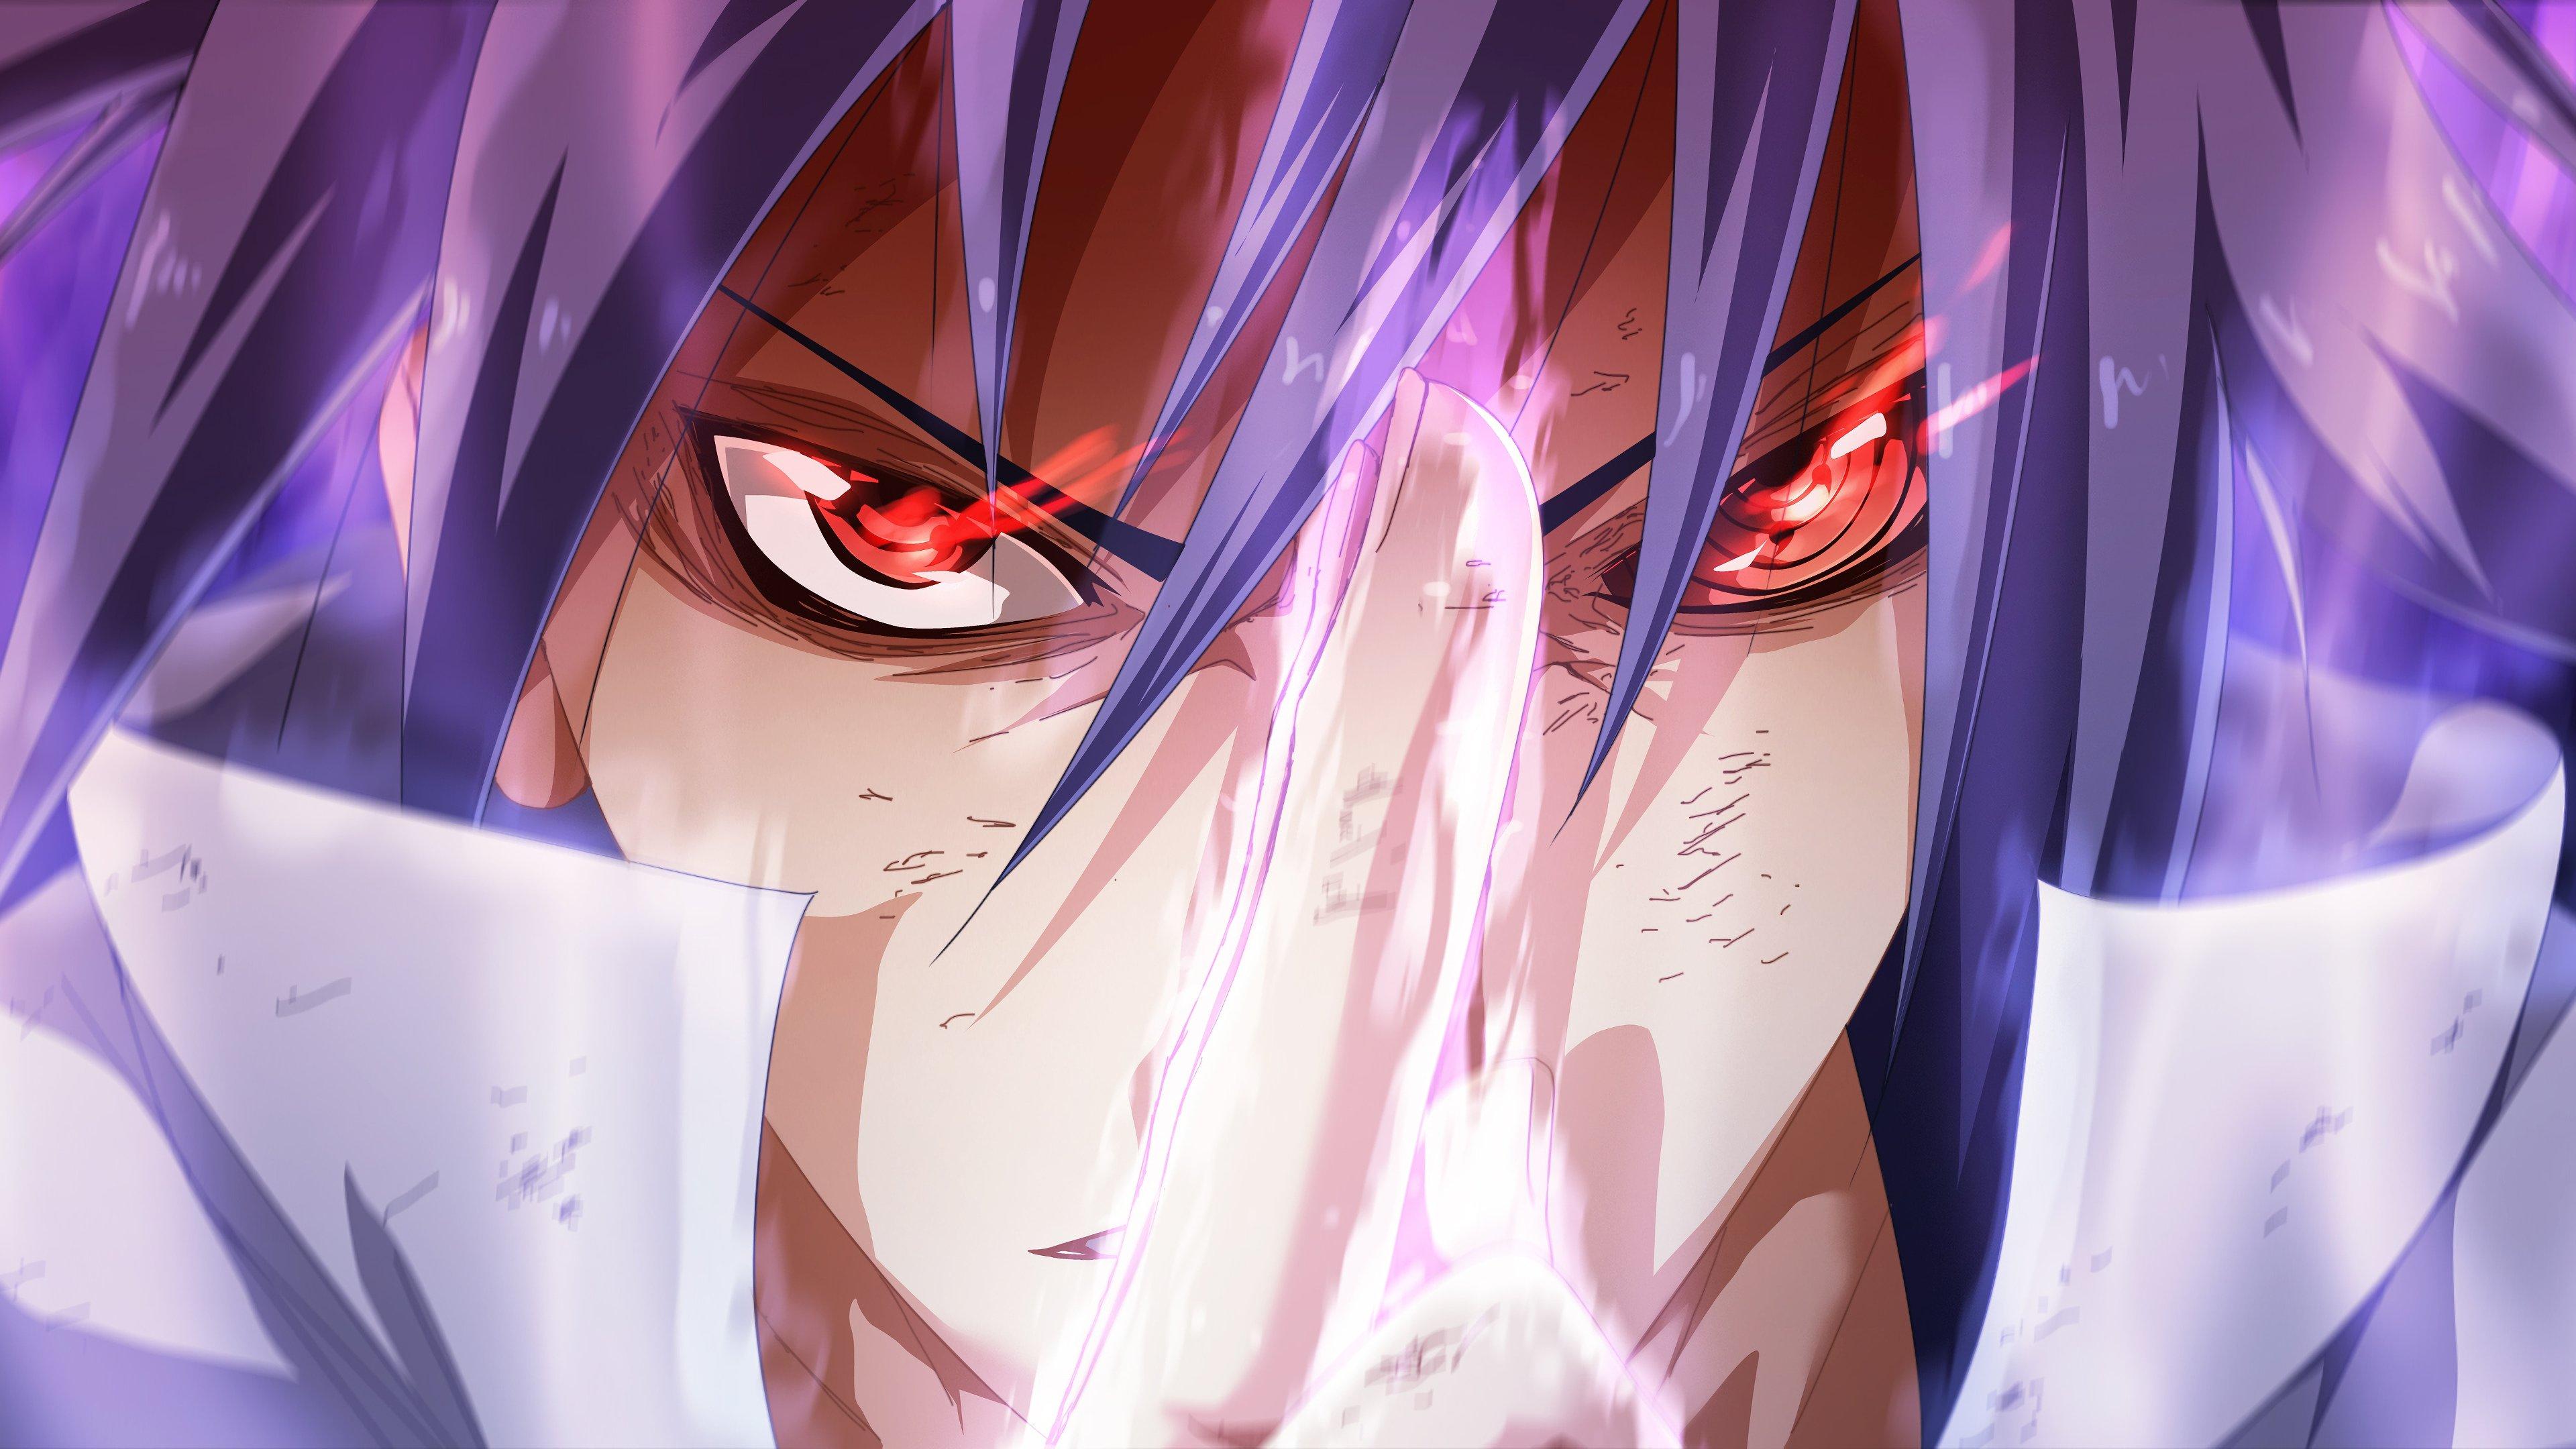 Fondos de pantalla Anime Sasuke Sharingan Rinnegan